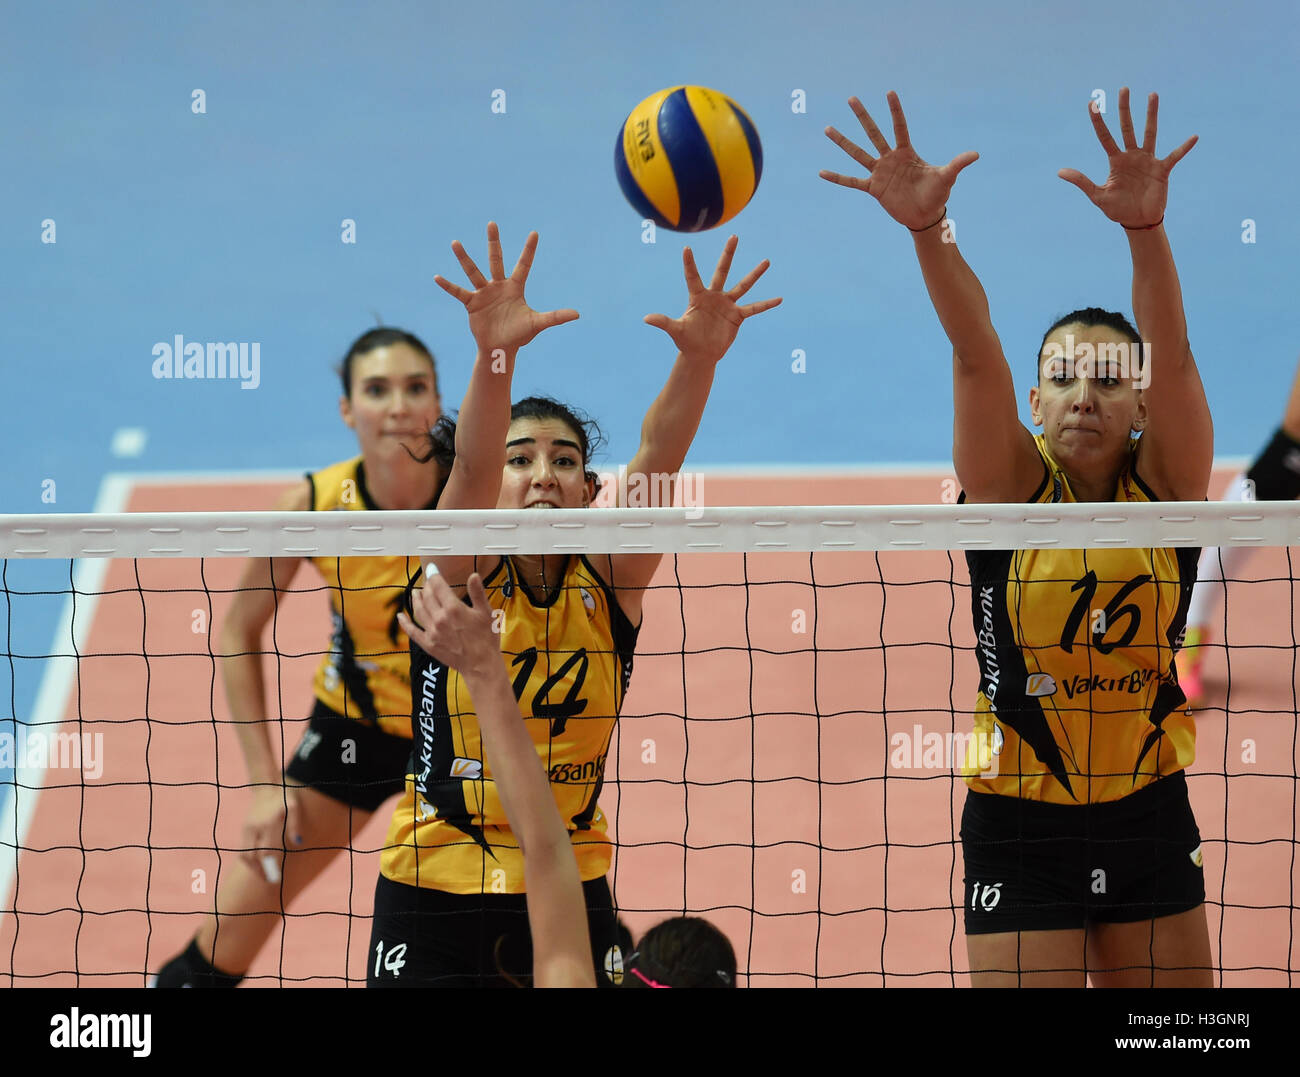 (161009)--ISTANBUL, 9. Okt., 2016(Xinhua)--Vakifbank Player Milena Rasic (R) und Melis Durul blockieren den Ball Stockbild